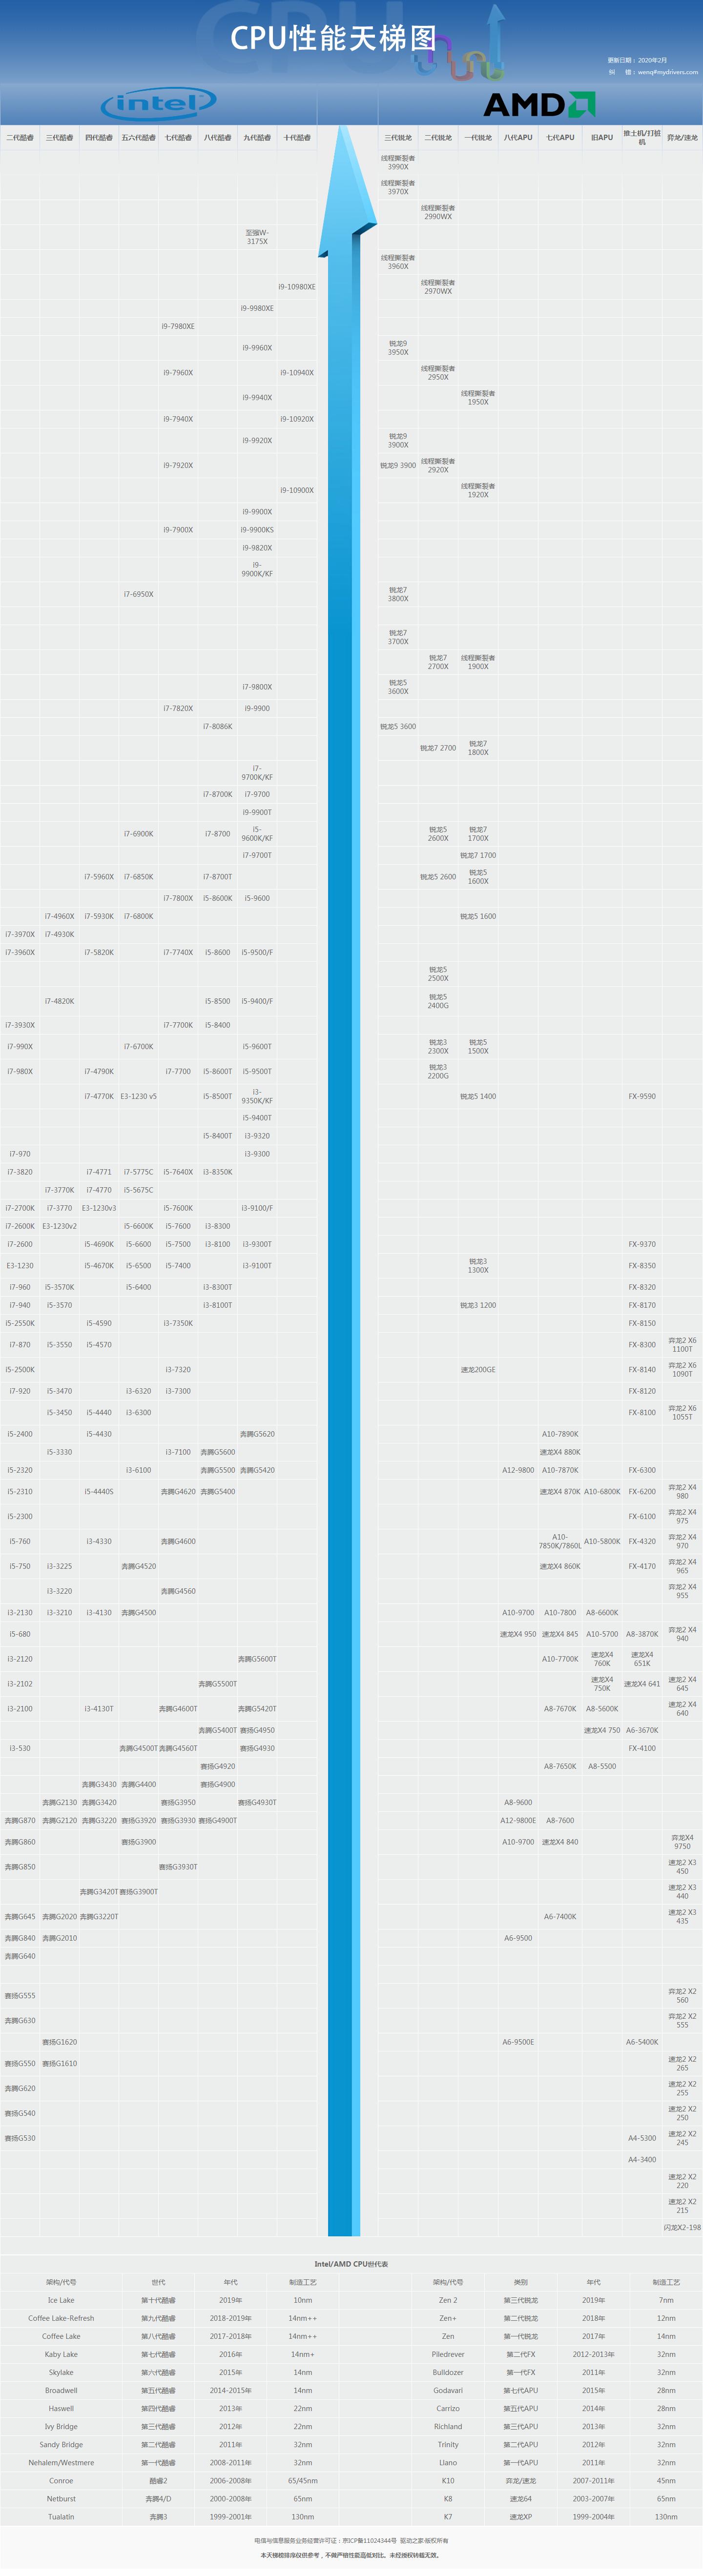 cpu性能天梯图2020年2月高清版